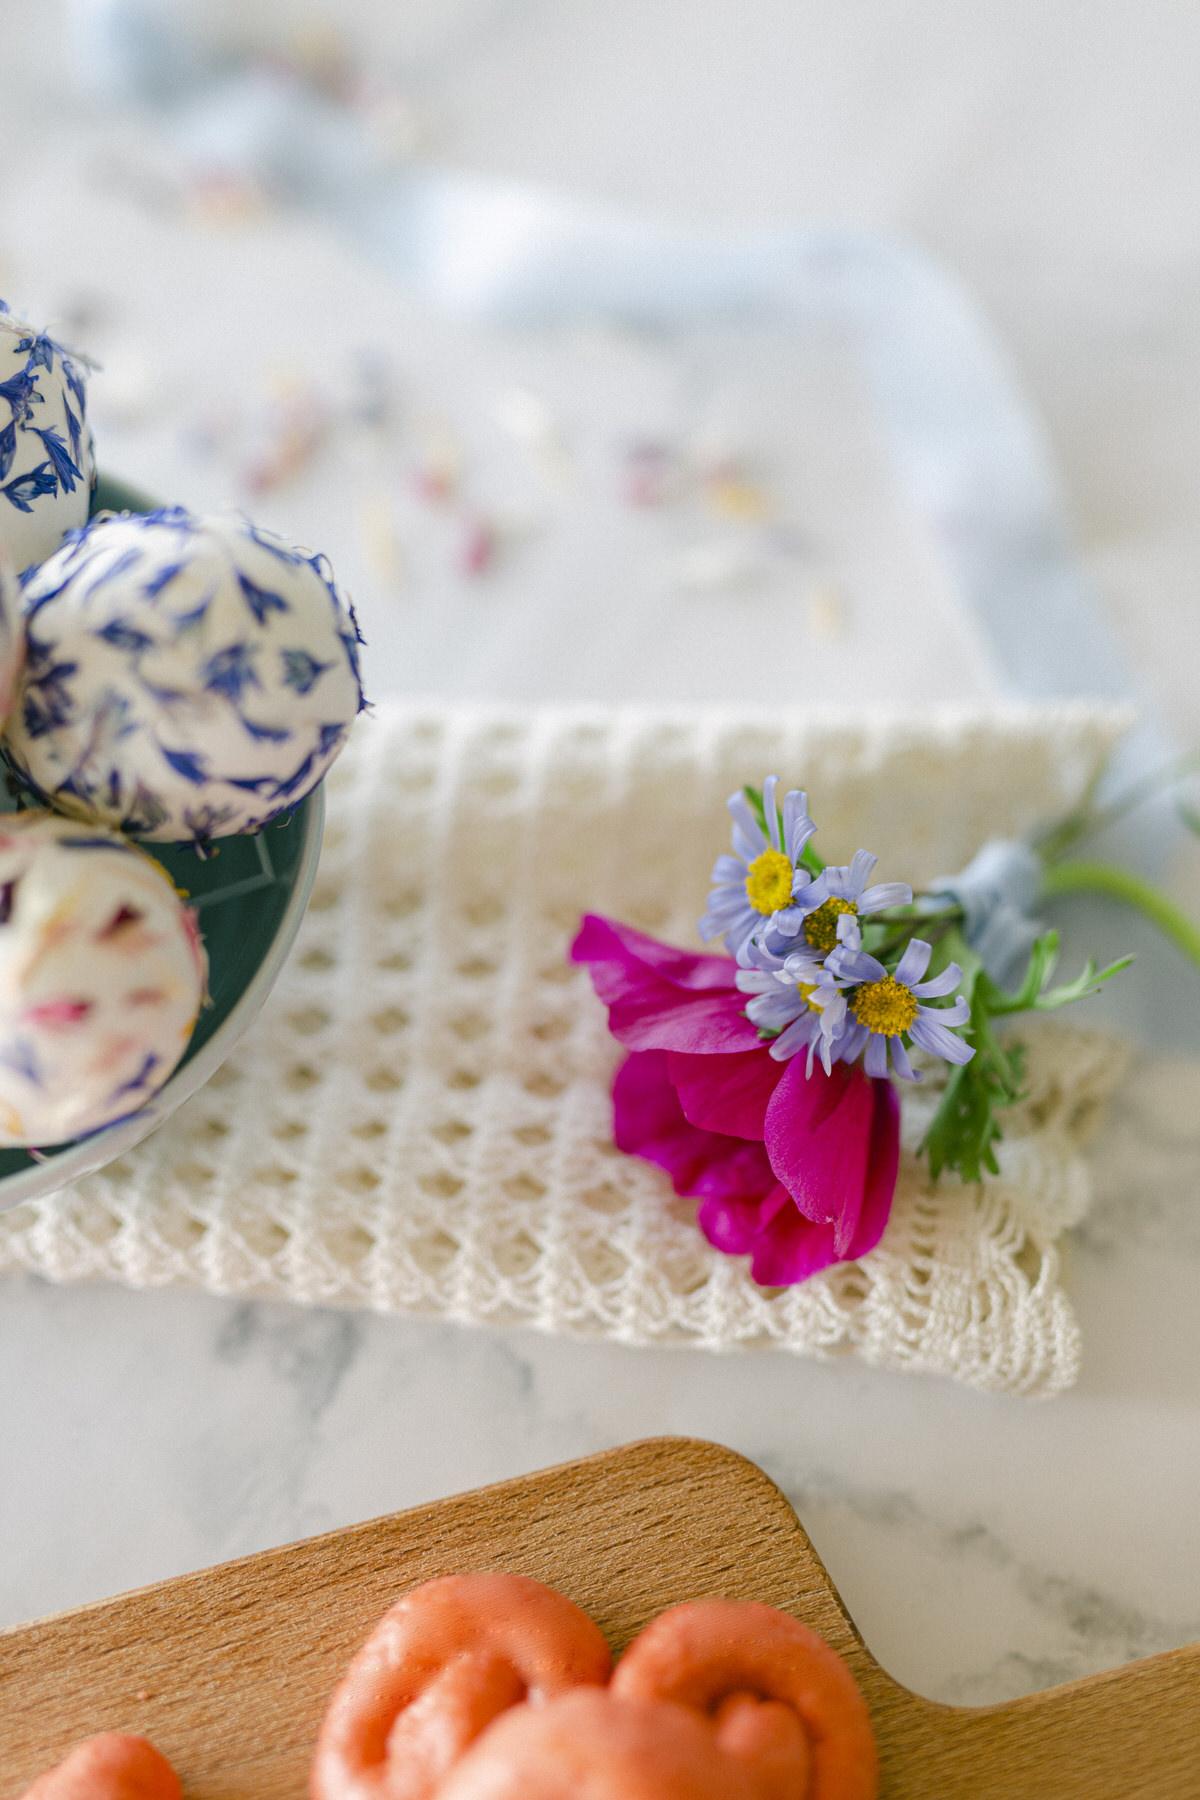 Monika Kritikou Photographer - Happy Easter